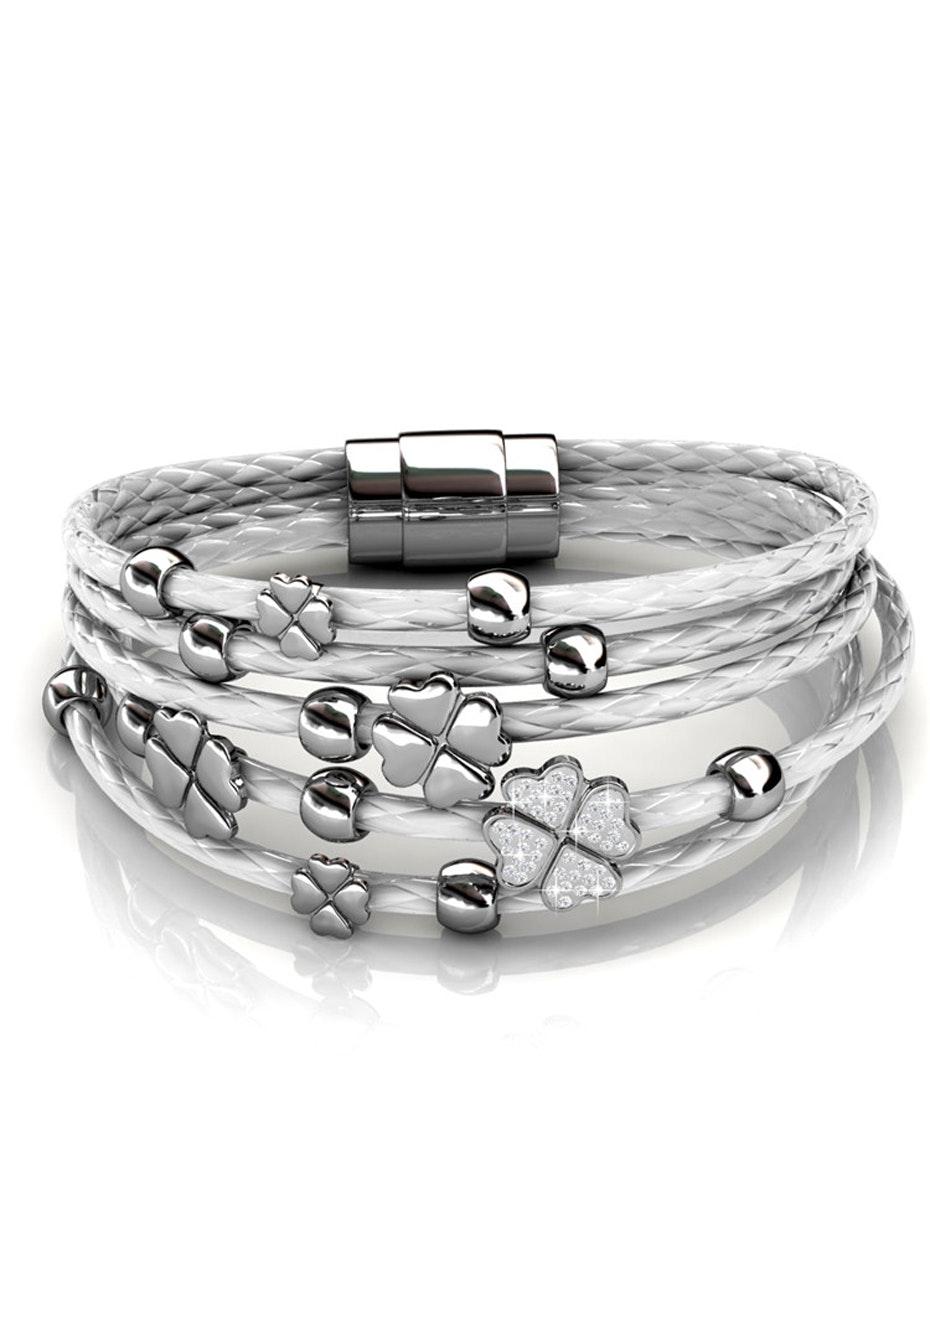 Clover Bracelet Ft Swarovski Elements -WG